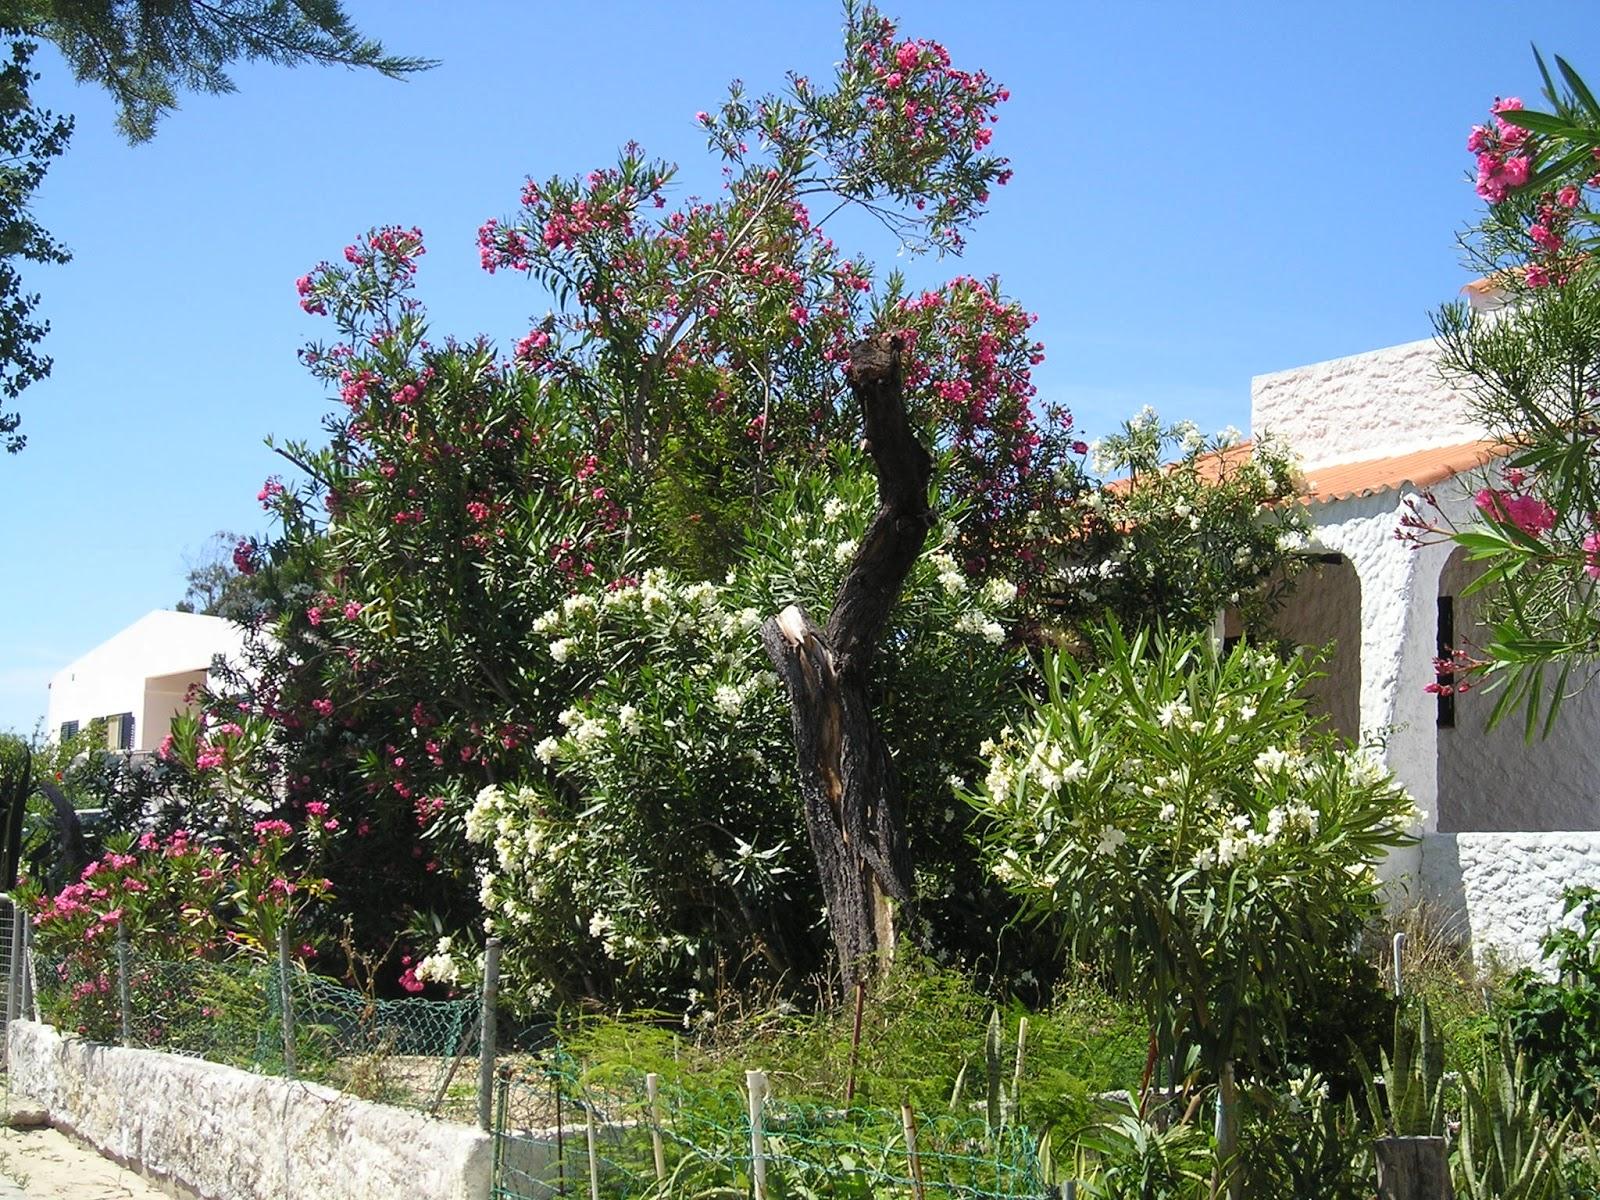 portugalenphotos armona et ses jardins. Black Bedroom Furniture Sets. Home Design Ideas